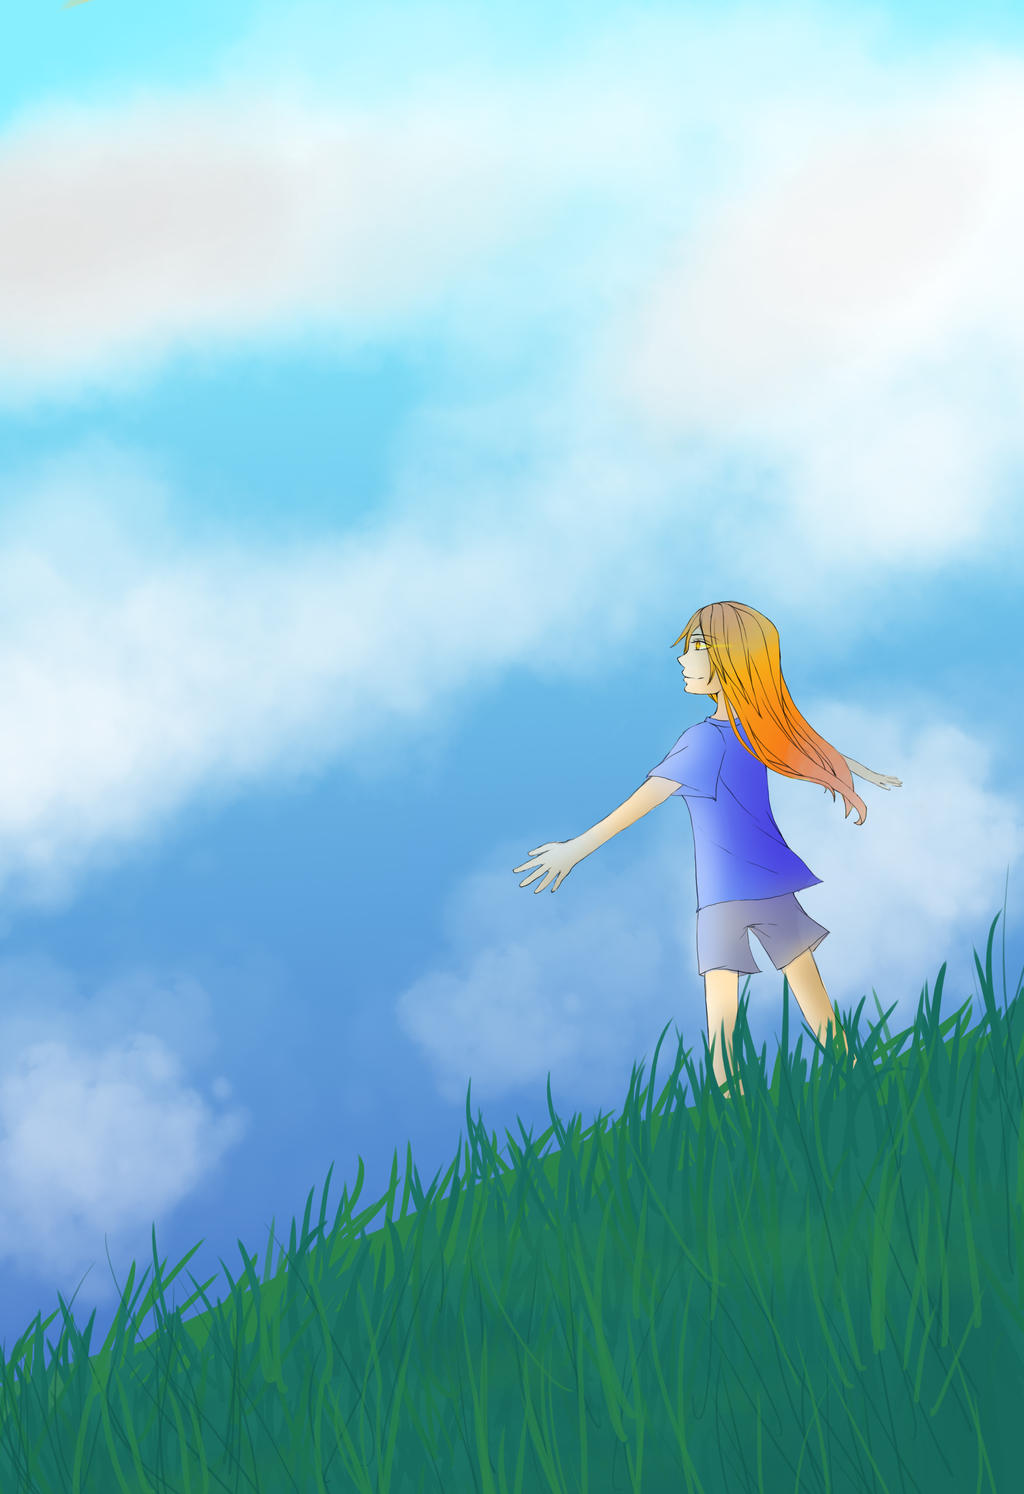 Embrace the sky by RavenMomoka